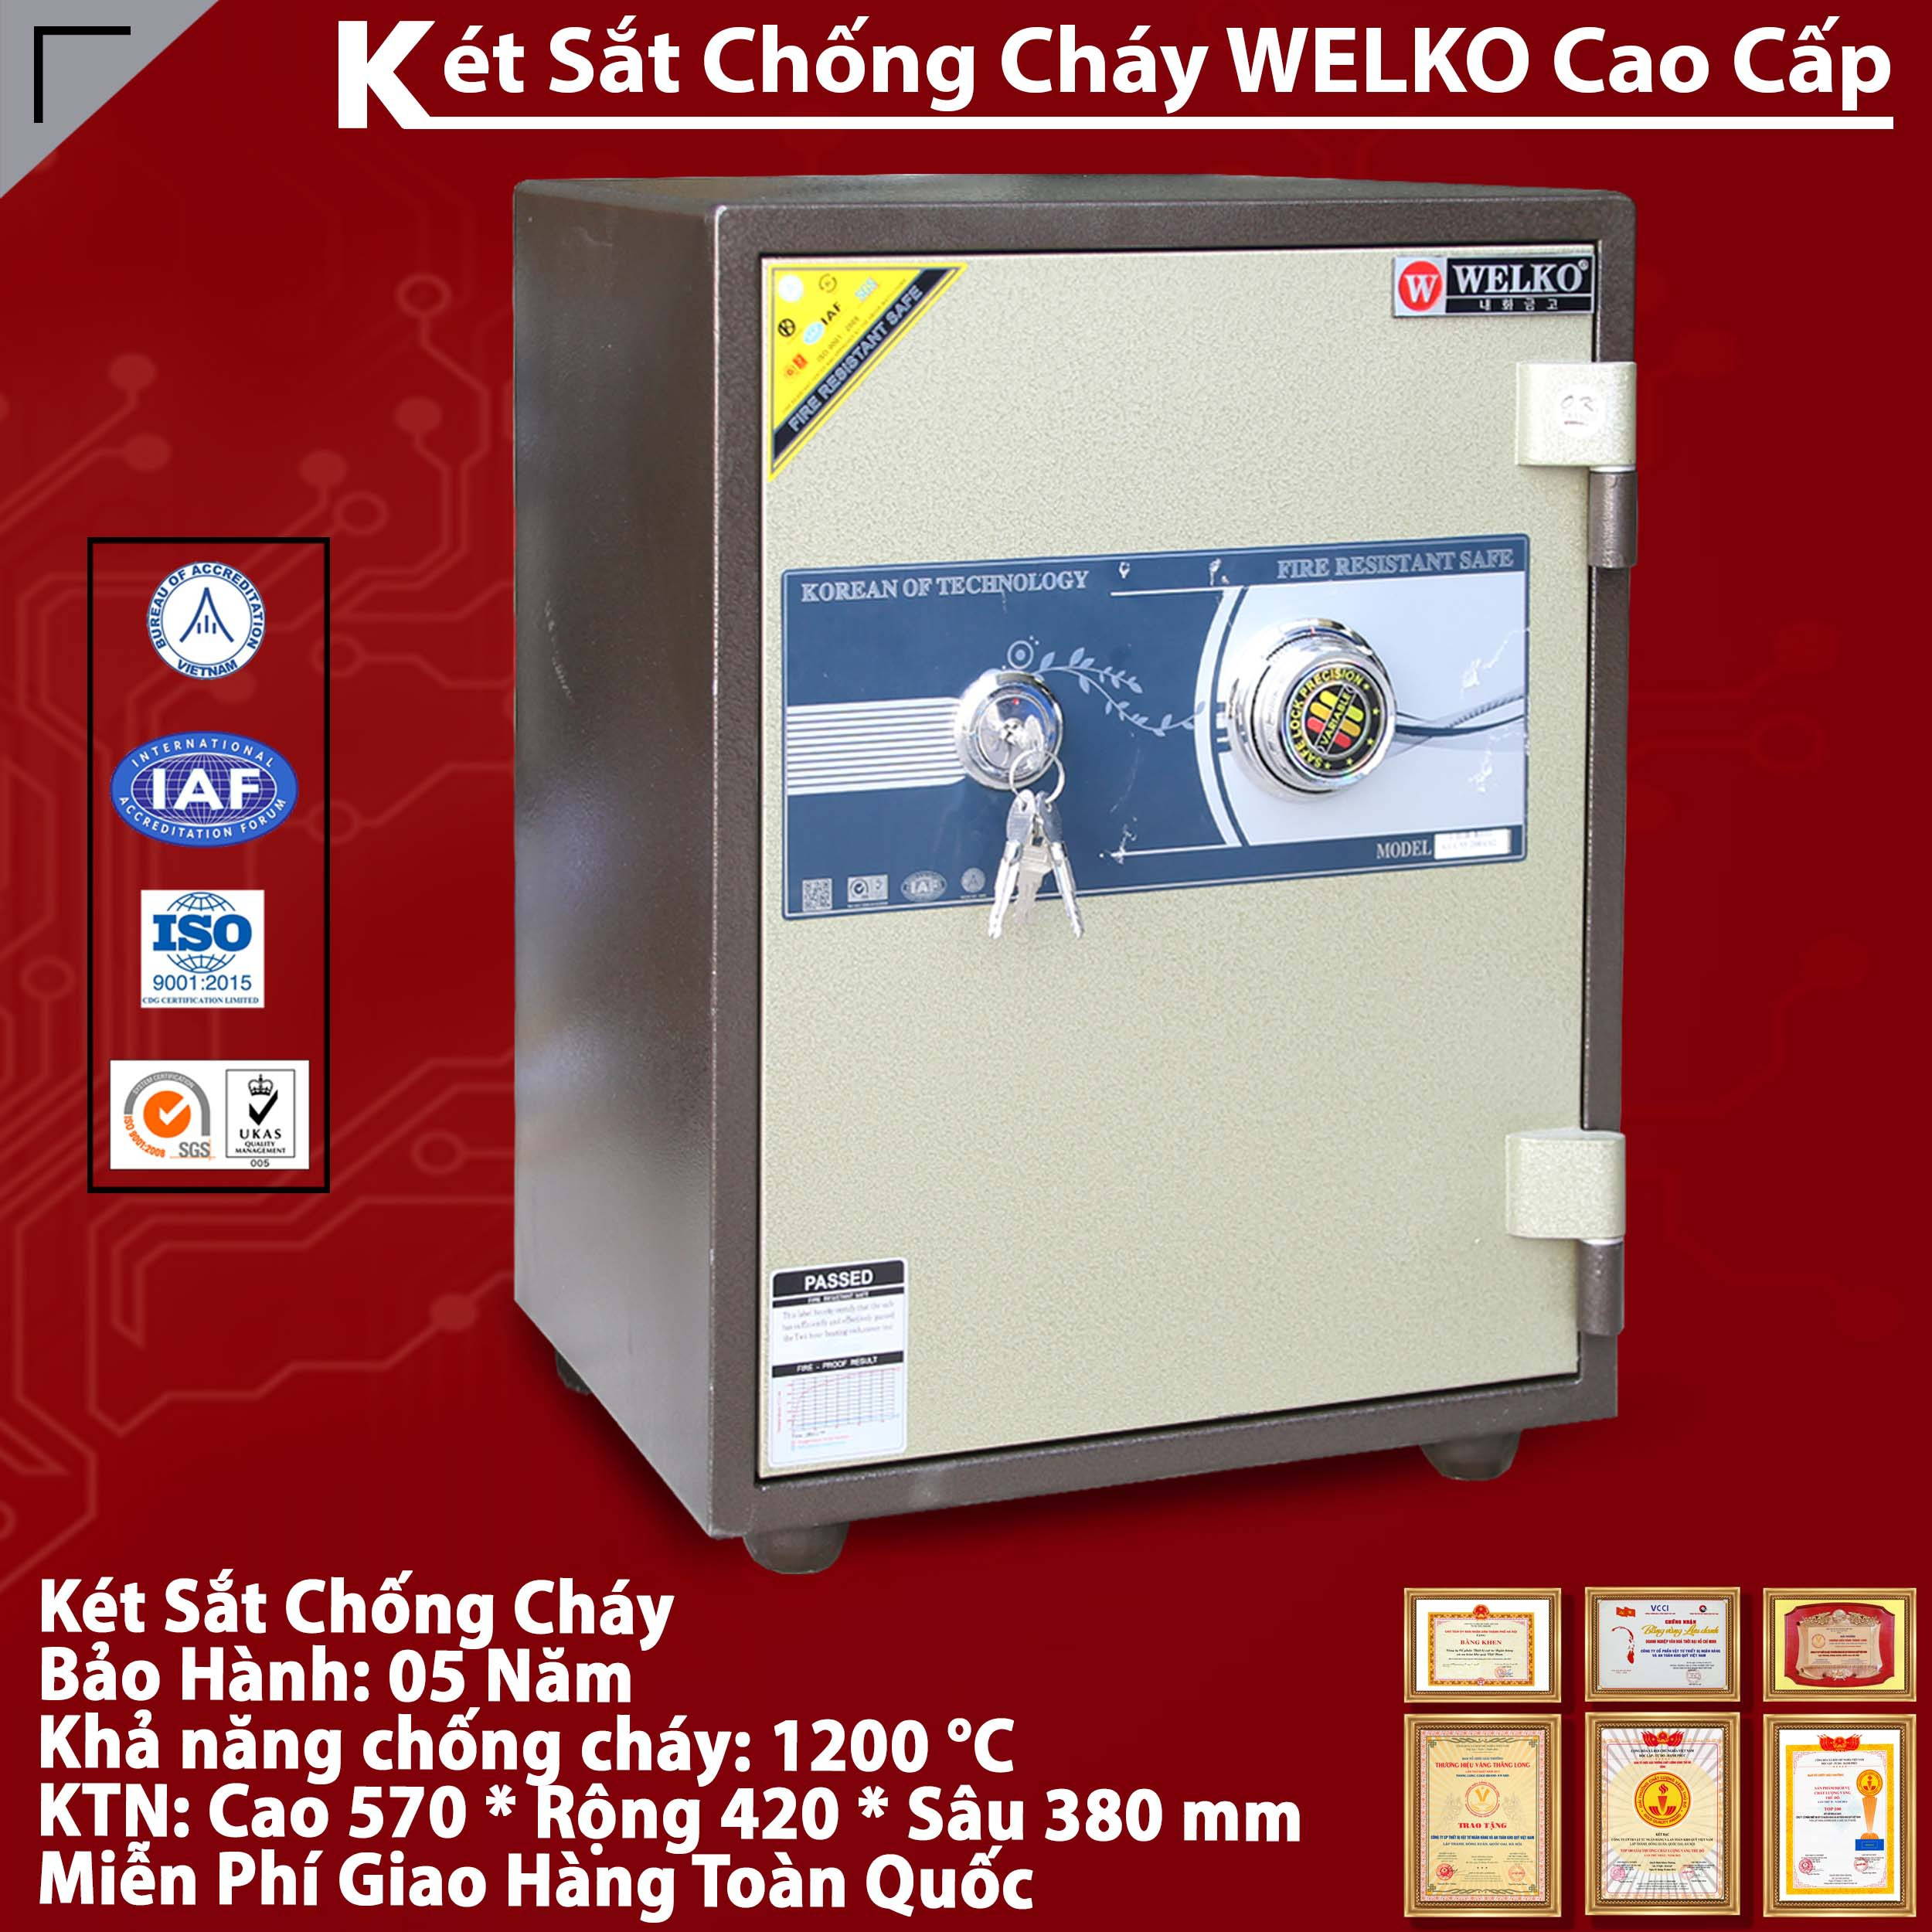 Ket Sat Mini Han Quoc Chinh Hang